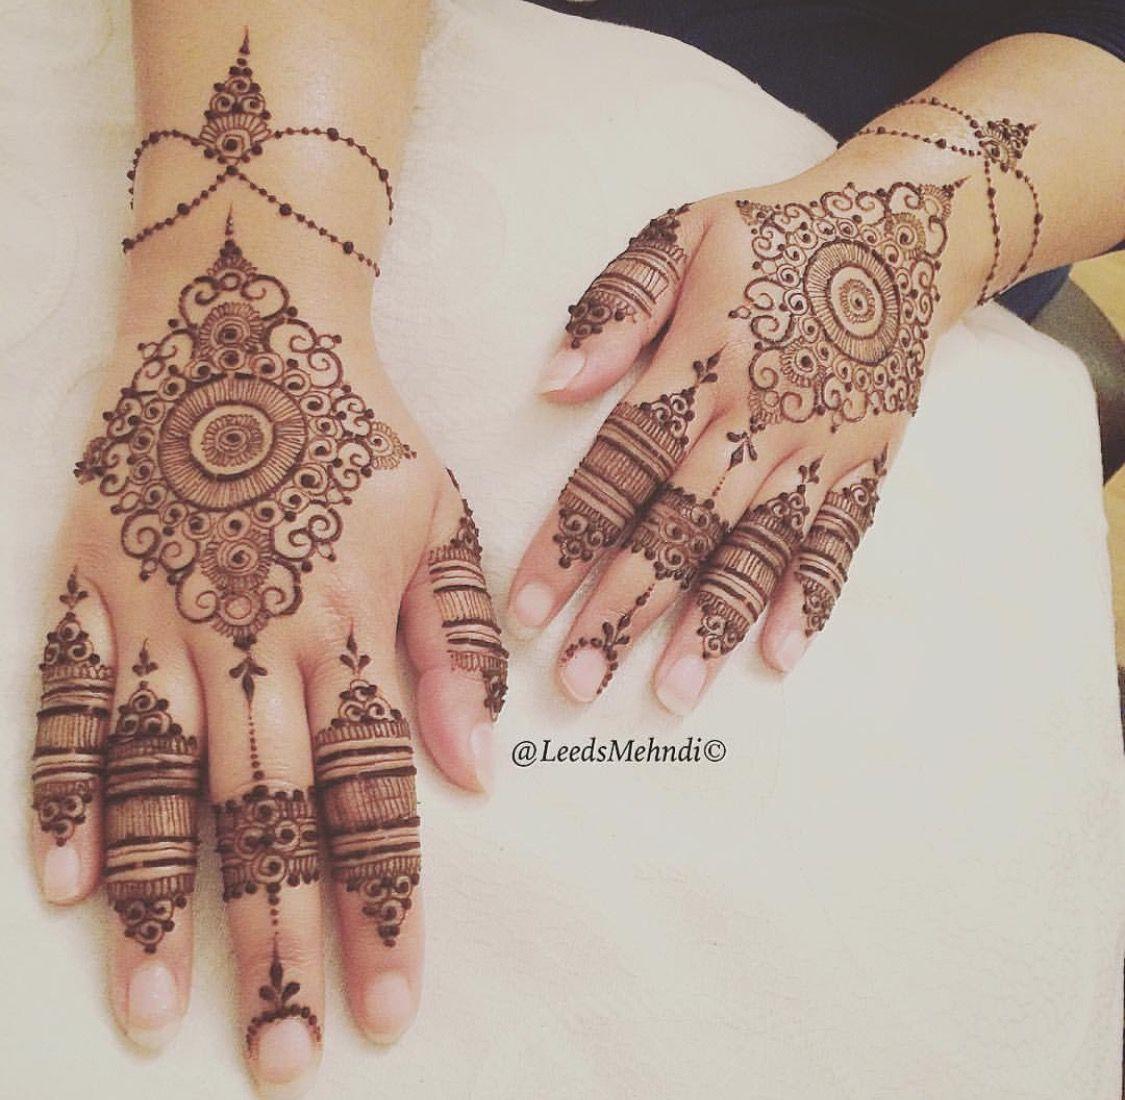 Pin by zulfa mj on henna pinterest hennas mehendi and henna designs